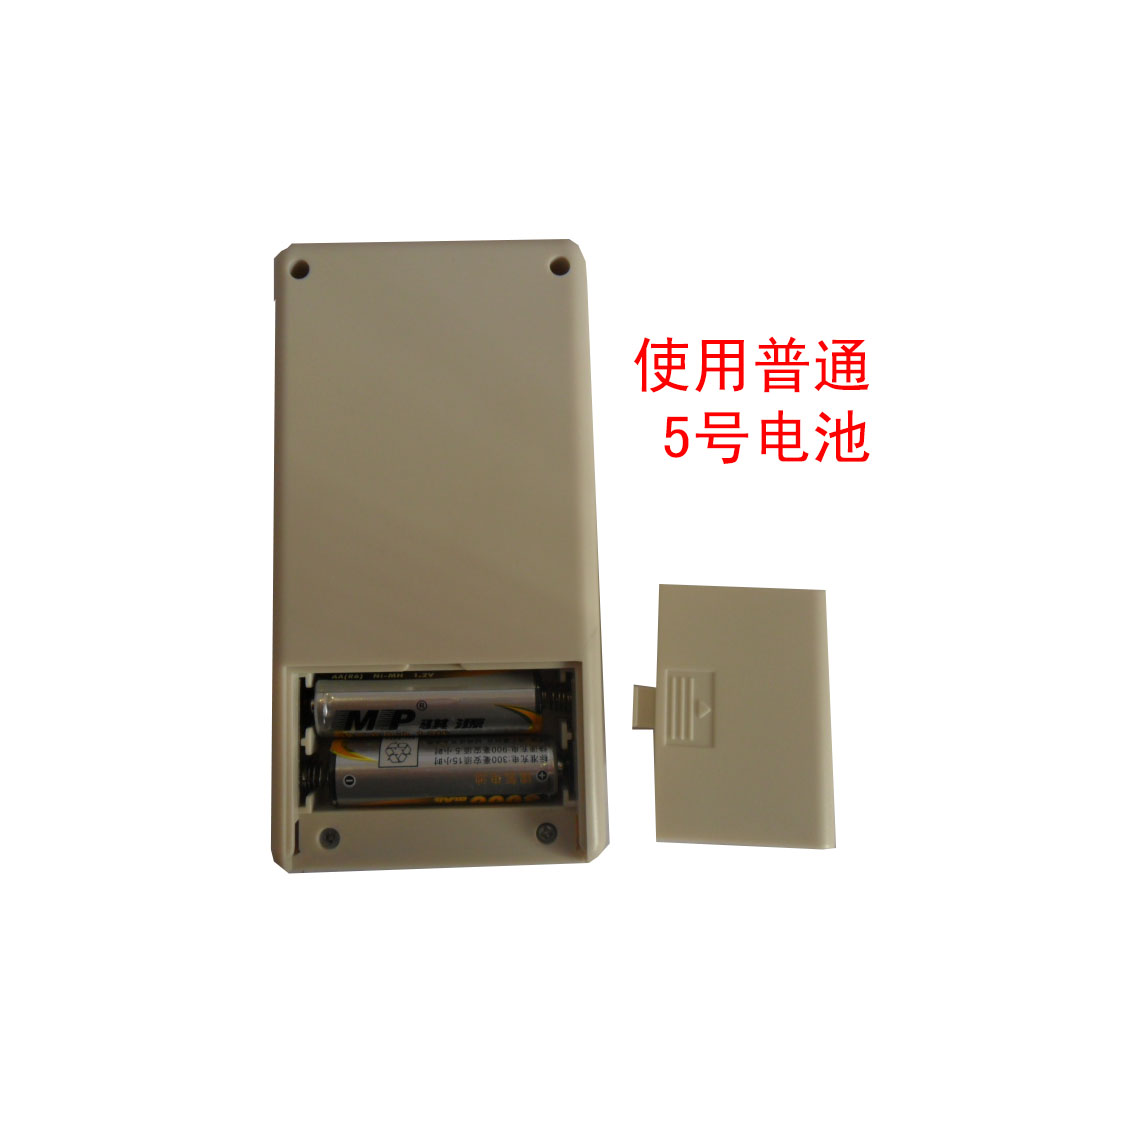 Image 5 - IC тестер транзистор интегральная схема IC тестер-in Запчасти для кондиционера from Бытовая техника